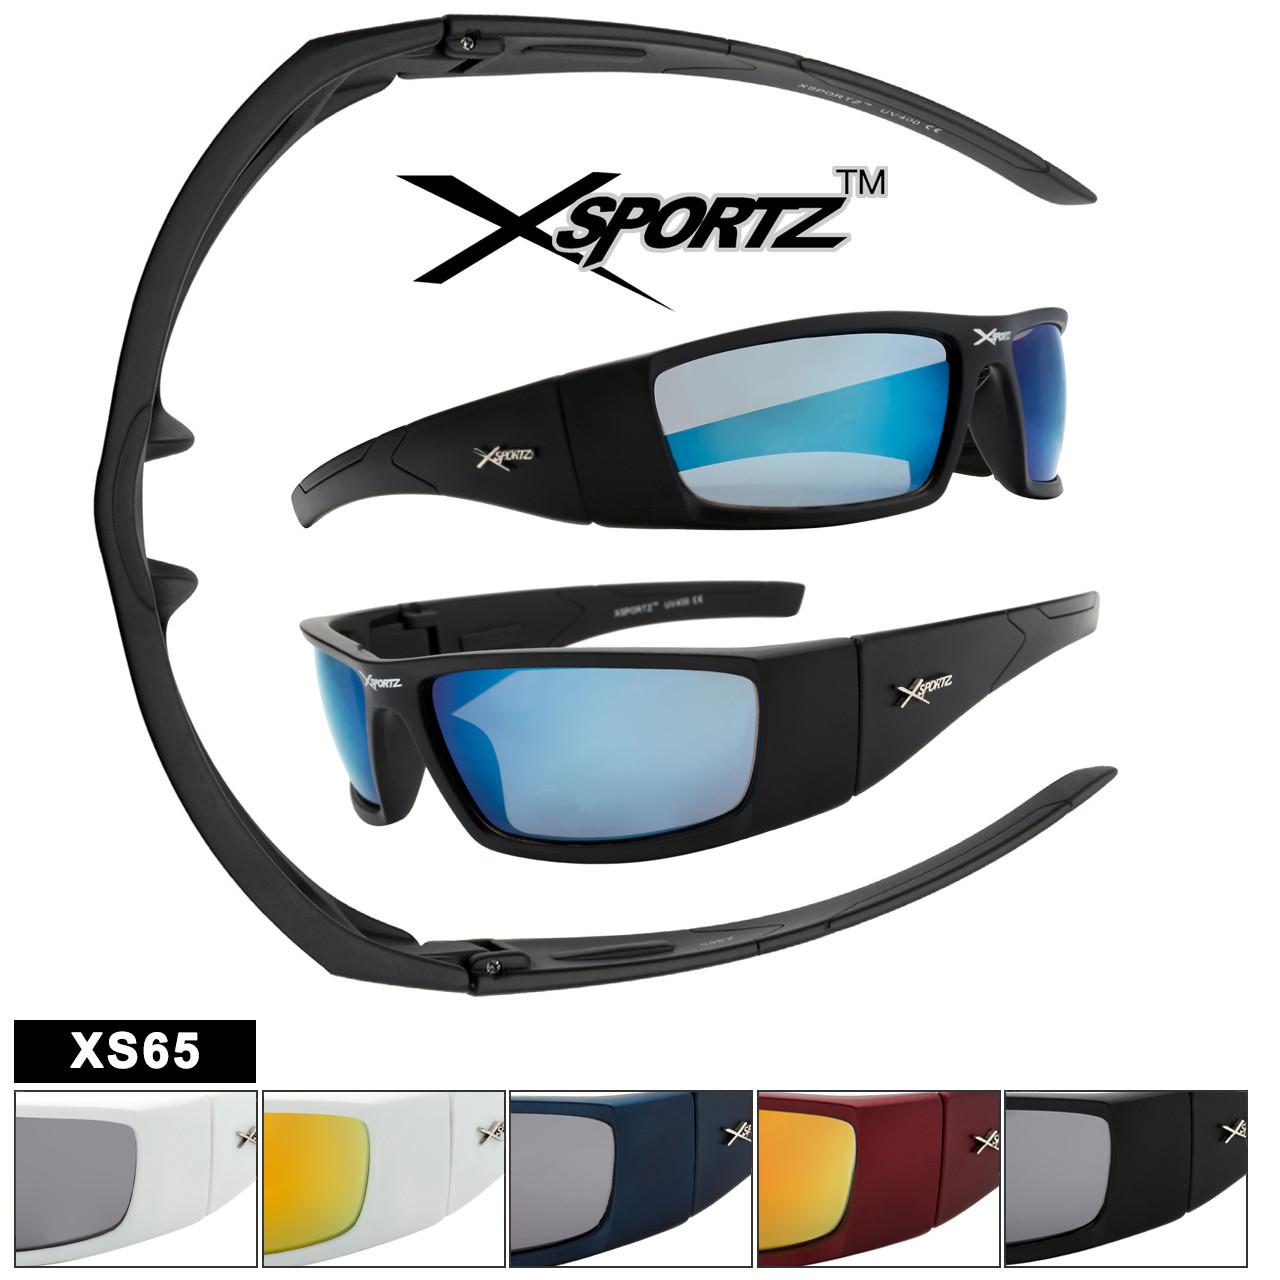 080738d890 Cheap Bulk Sunglasses Men s Xsportz XS65